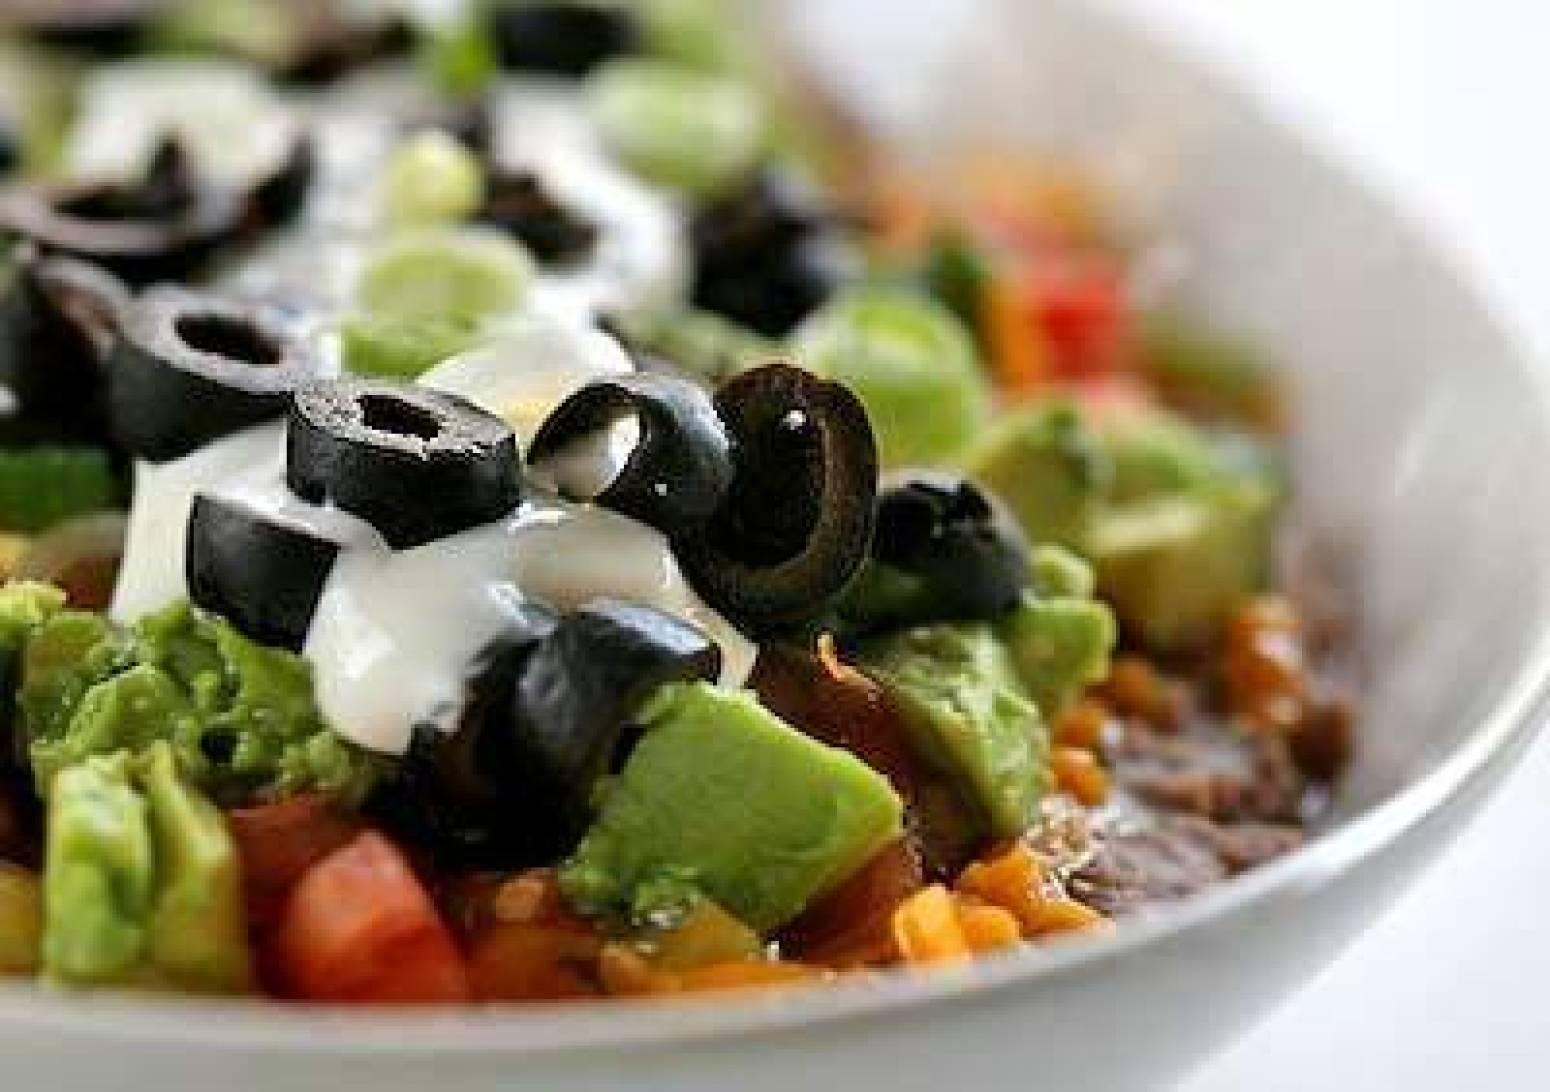 7 Layer Bean Dip Recipe 2 | Just A Pinch Recipes